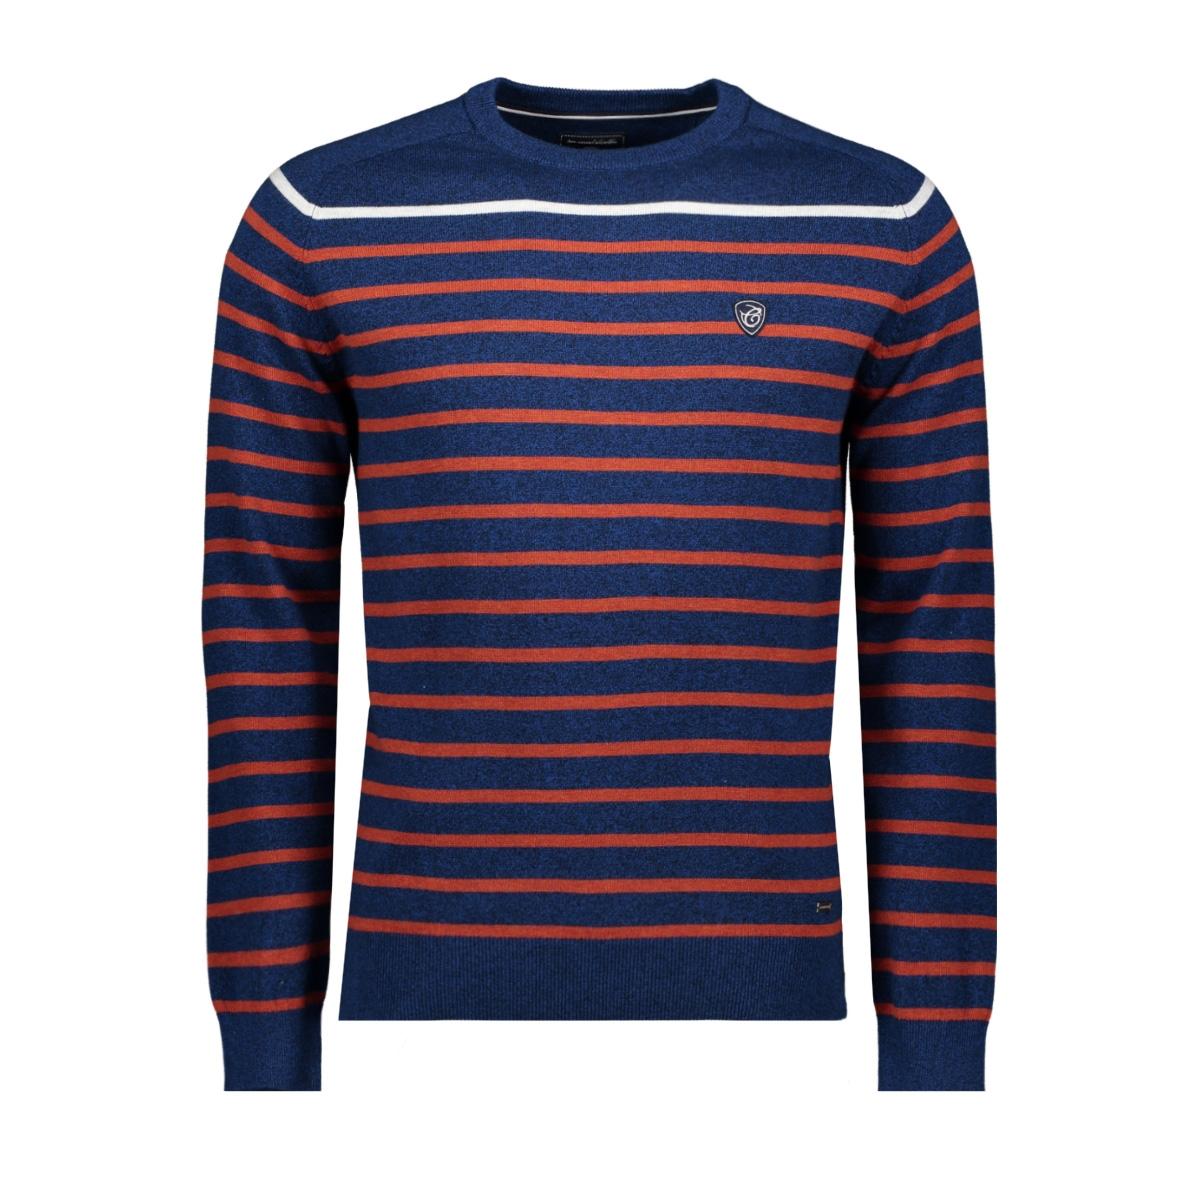 knitwear  harold 052964 campbell trui 382 navy / red